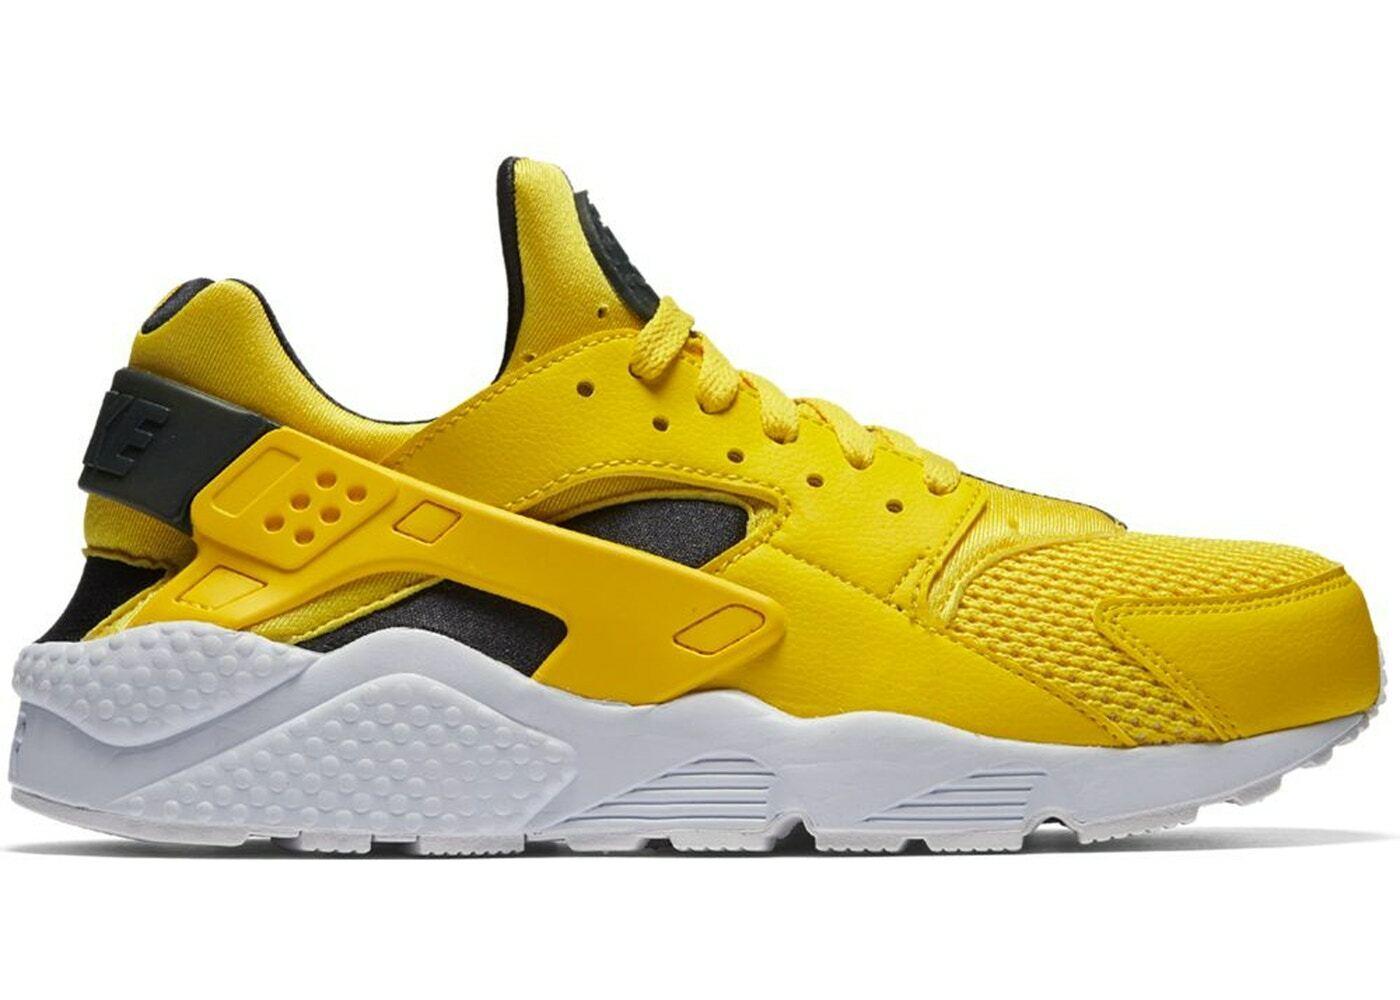 Nike Air Huarache Run Tour Yellow Size 13. 318429-700 react vapormax max